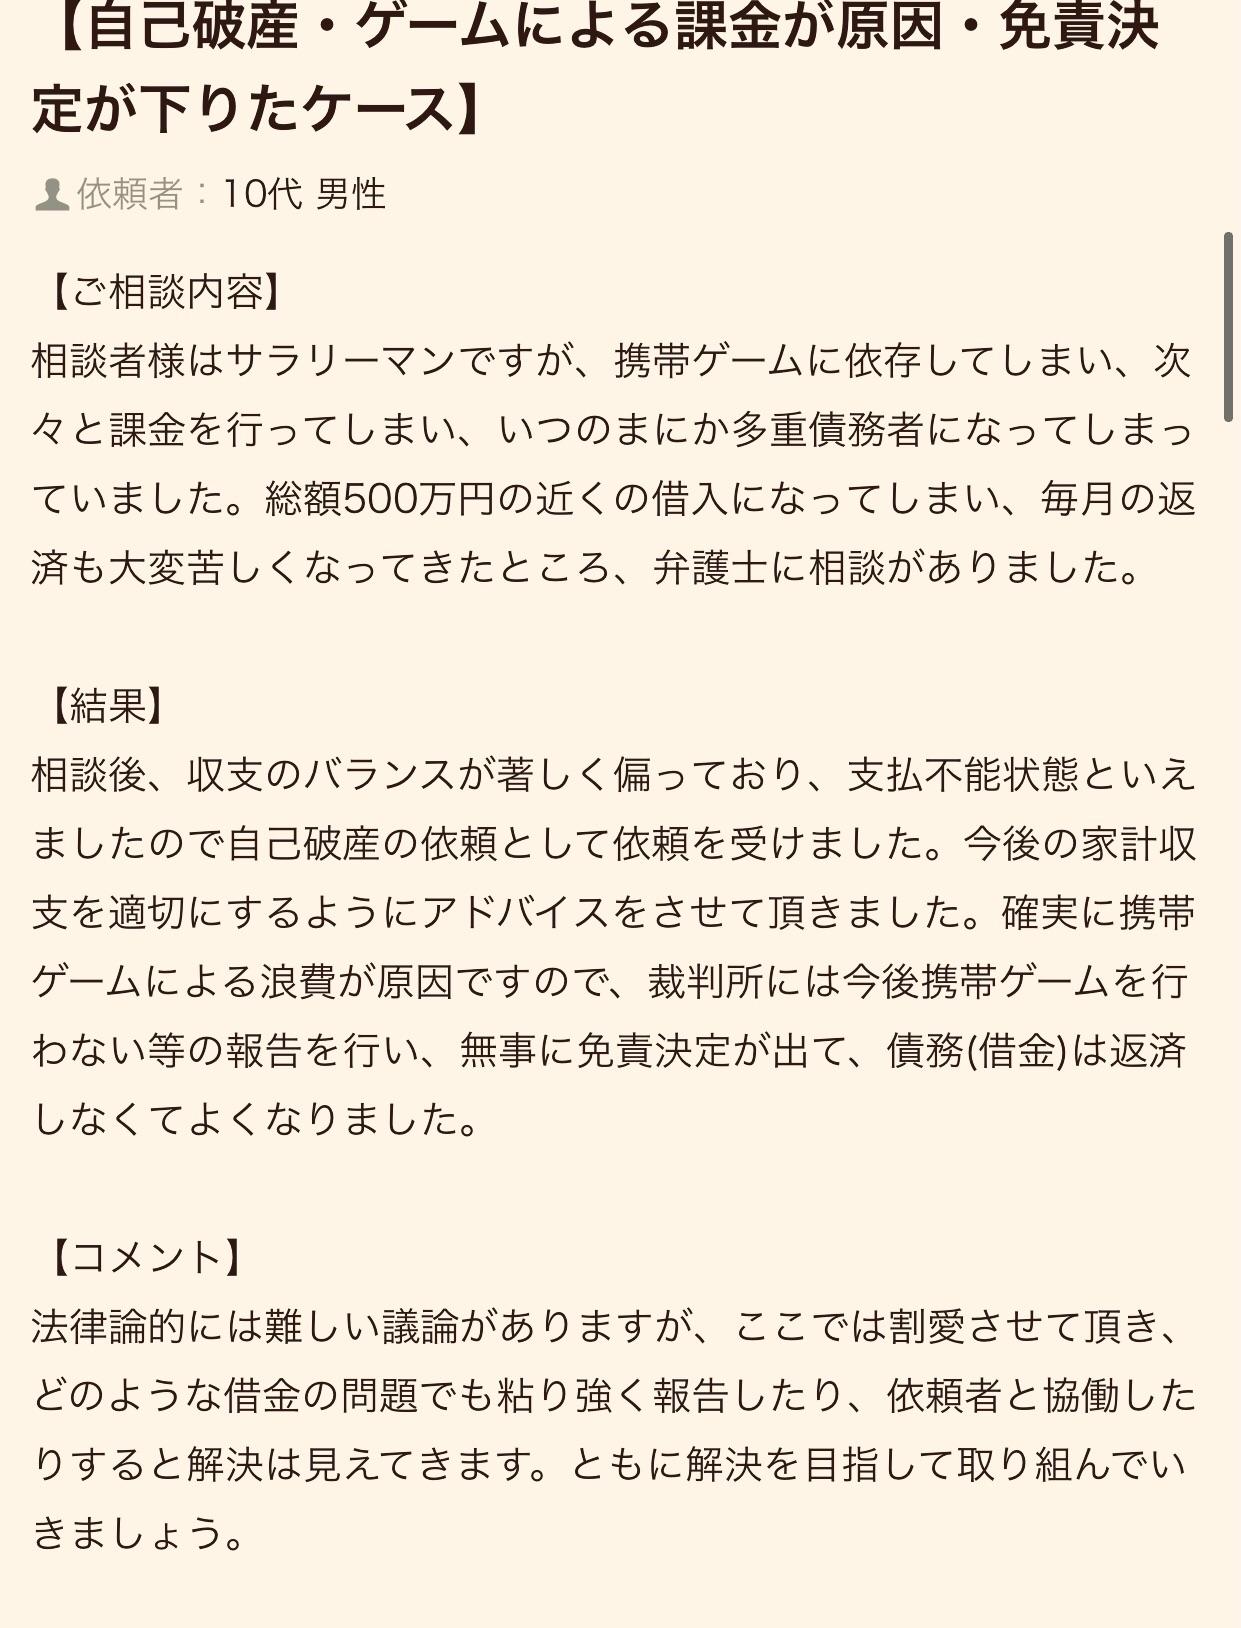 f:id:kagaribi-kotsujiko:20210122225342j:plain